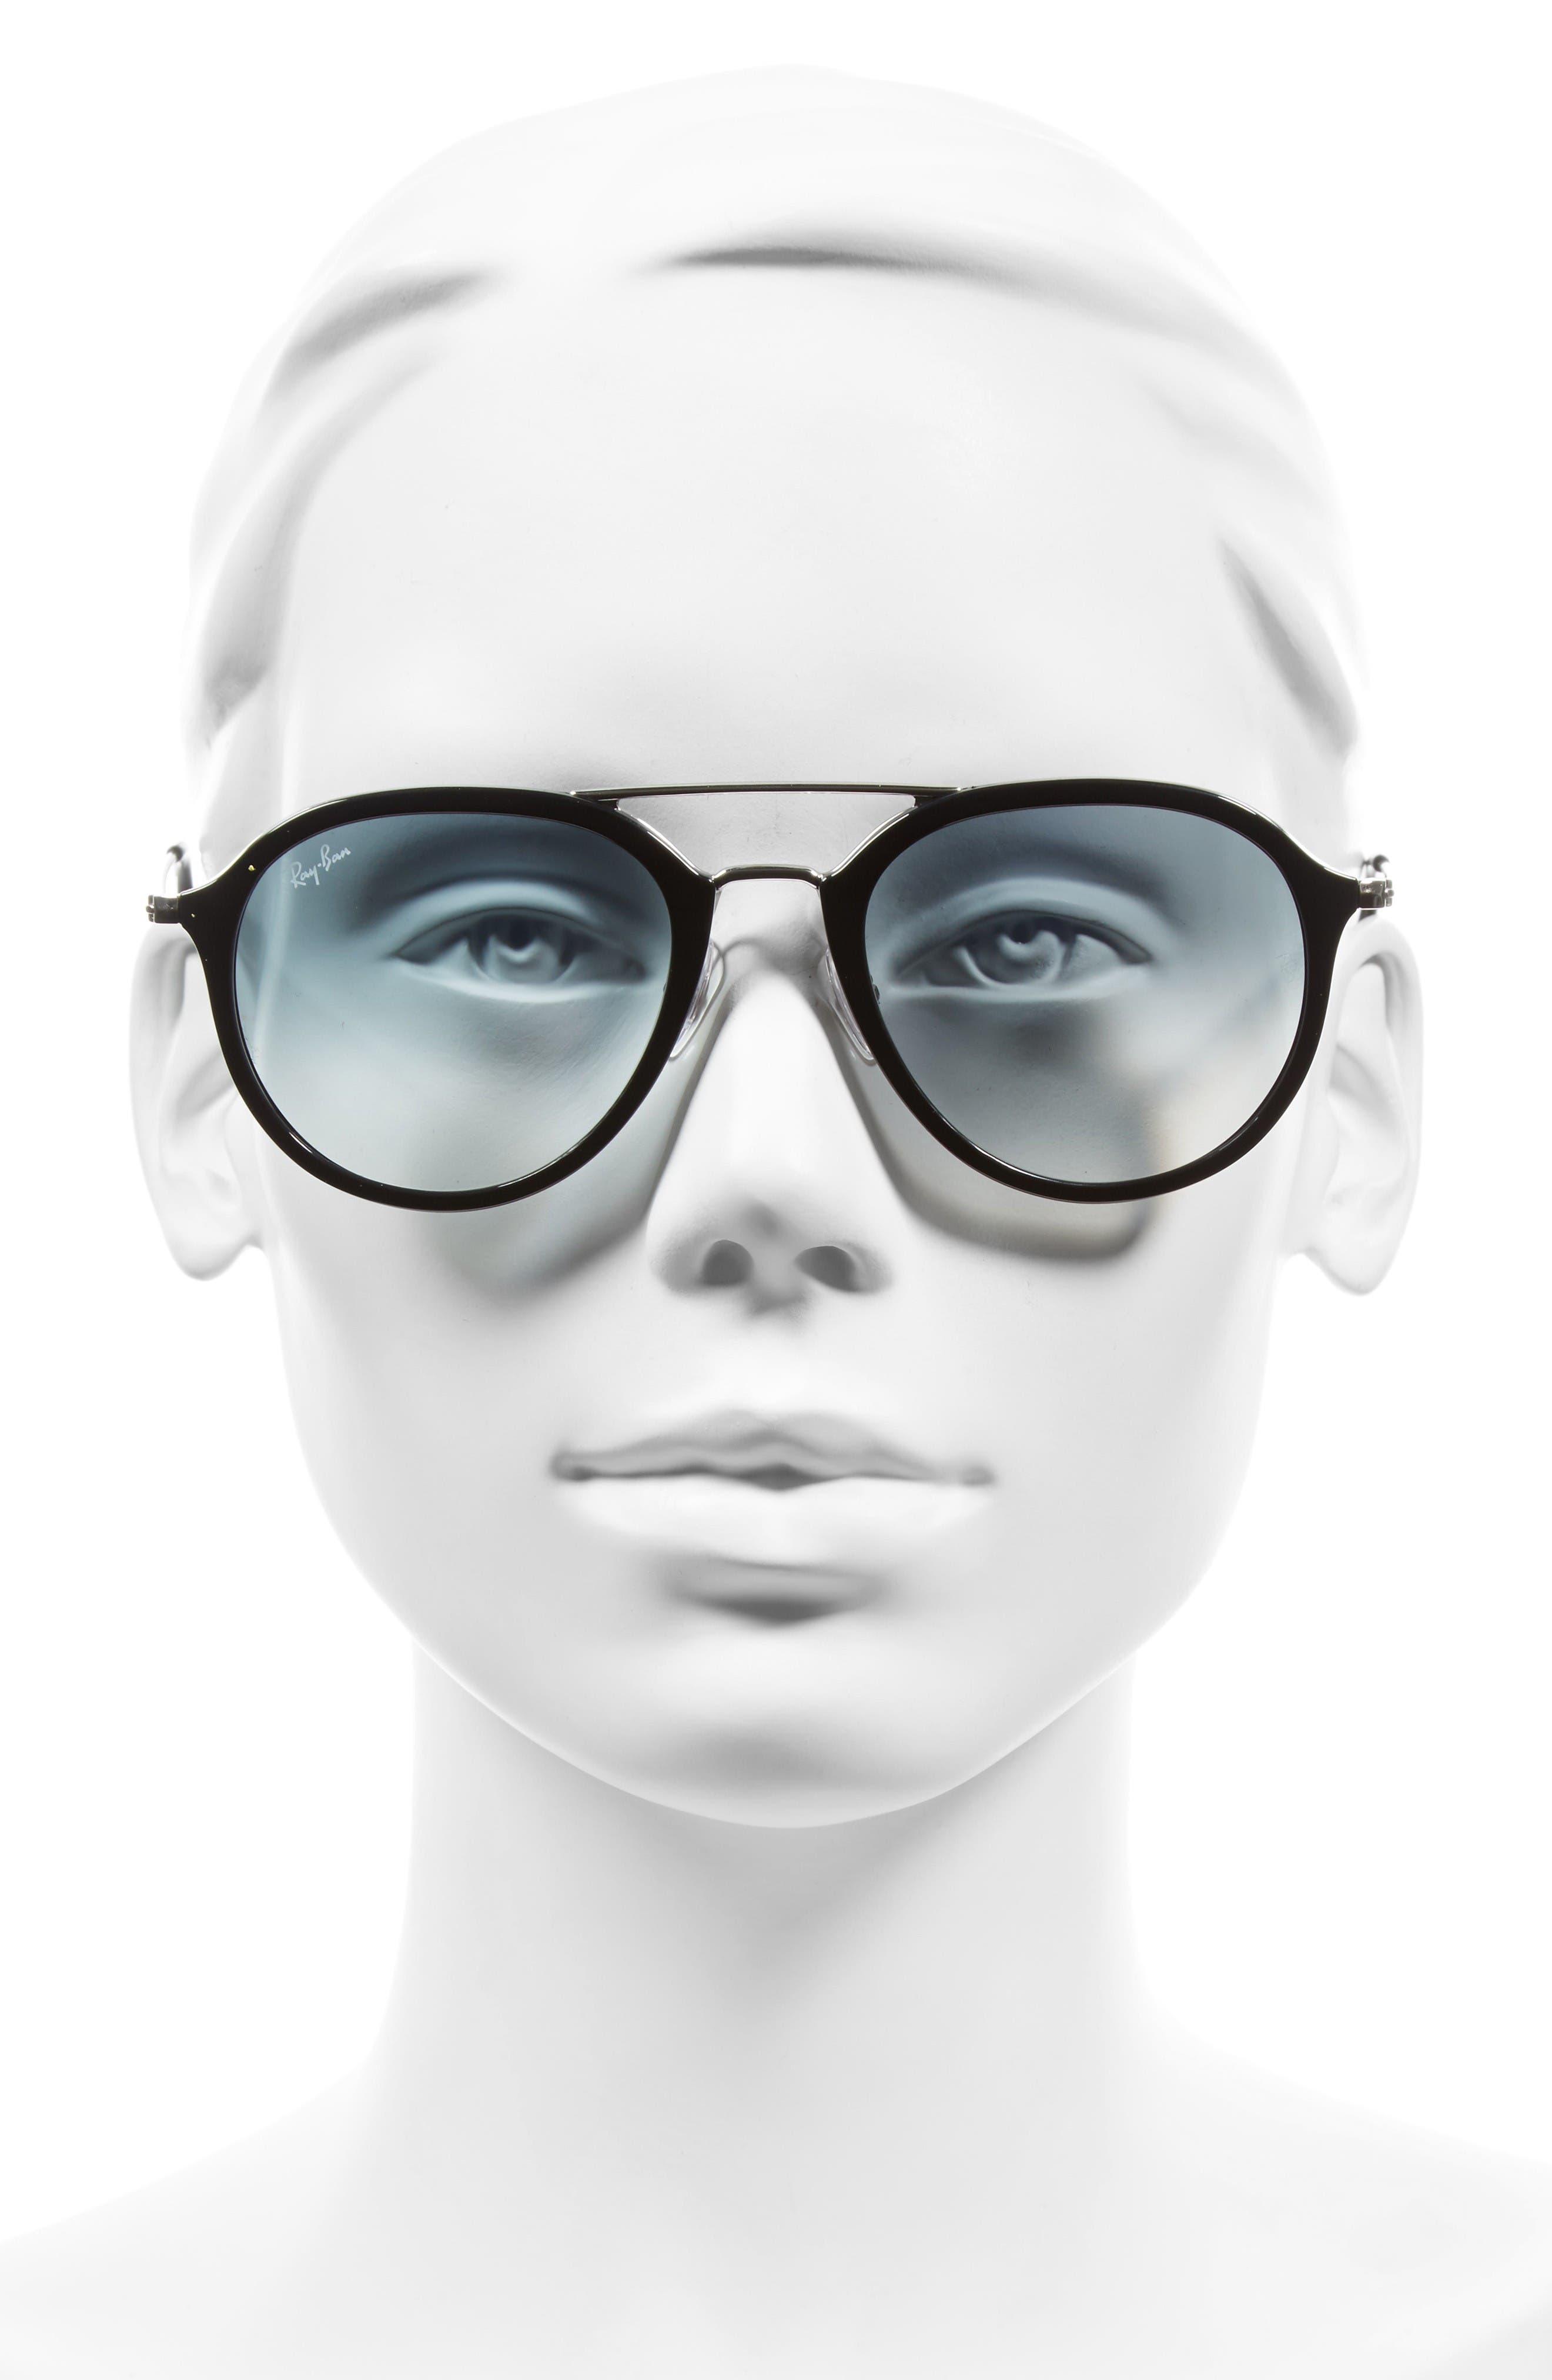 53mm Aviator Sunglasses,                             Alternate thumbnail 2, color,                             Black/ Silver